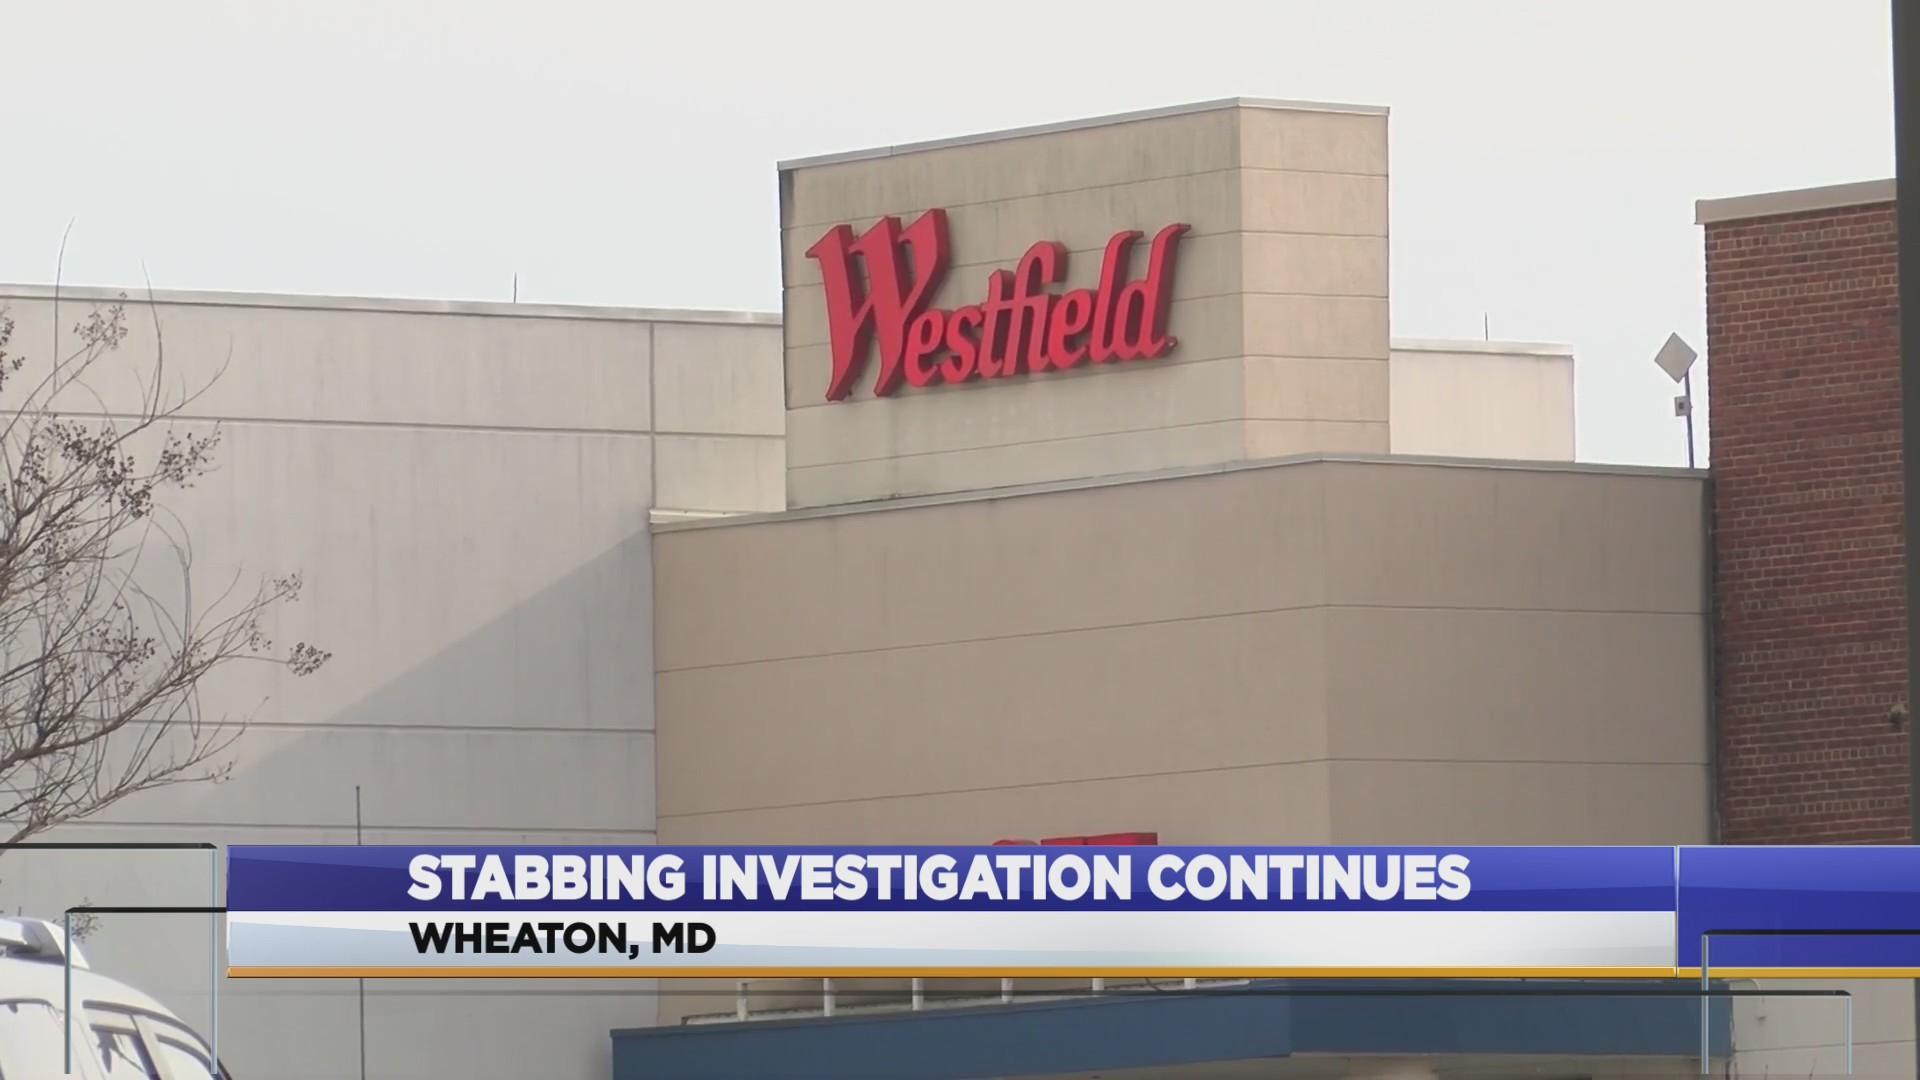 Westfield_stabbing_0_20181212222351